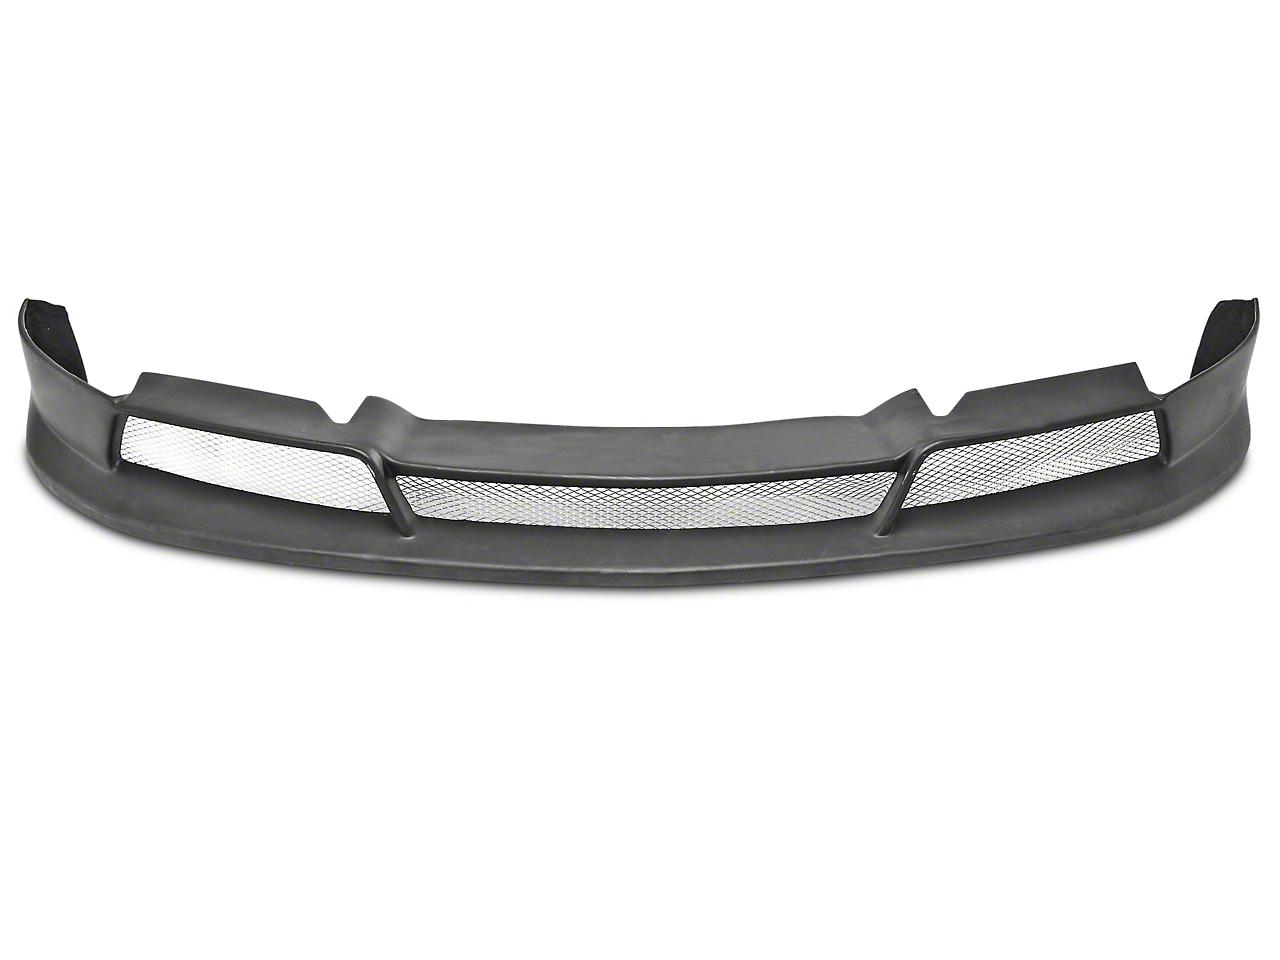 Duraflex Racer Style Body Kit - Unpainted (10-12 GT)